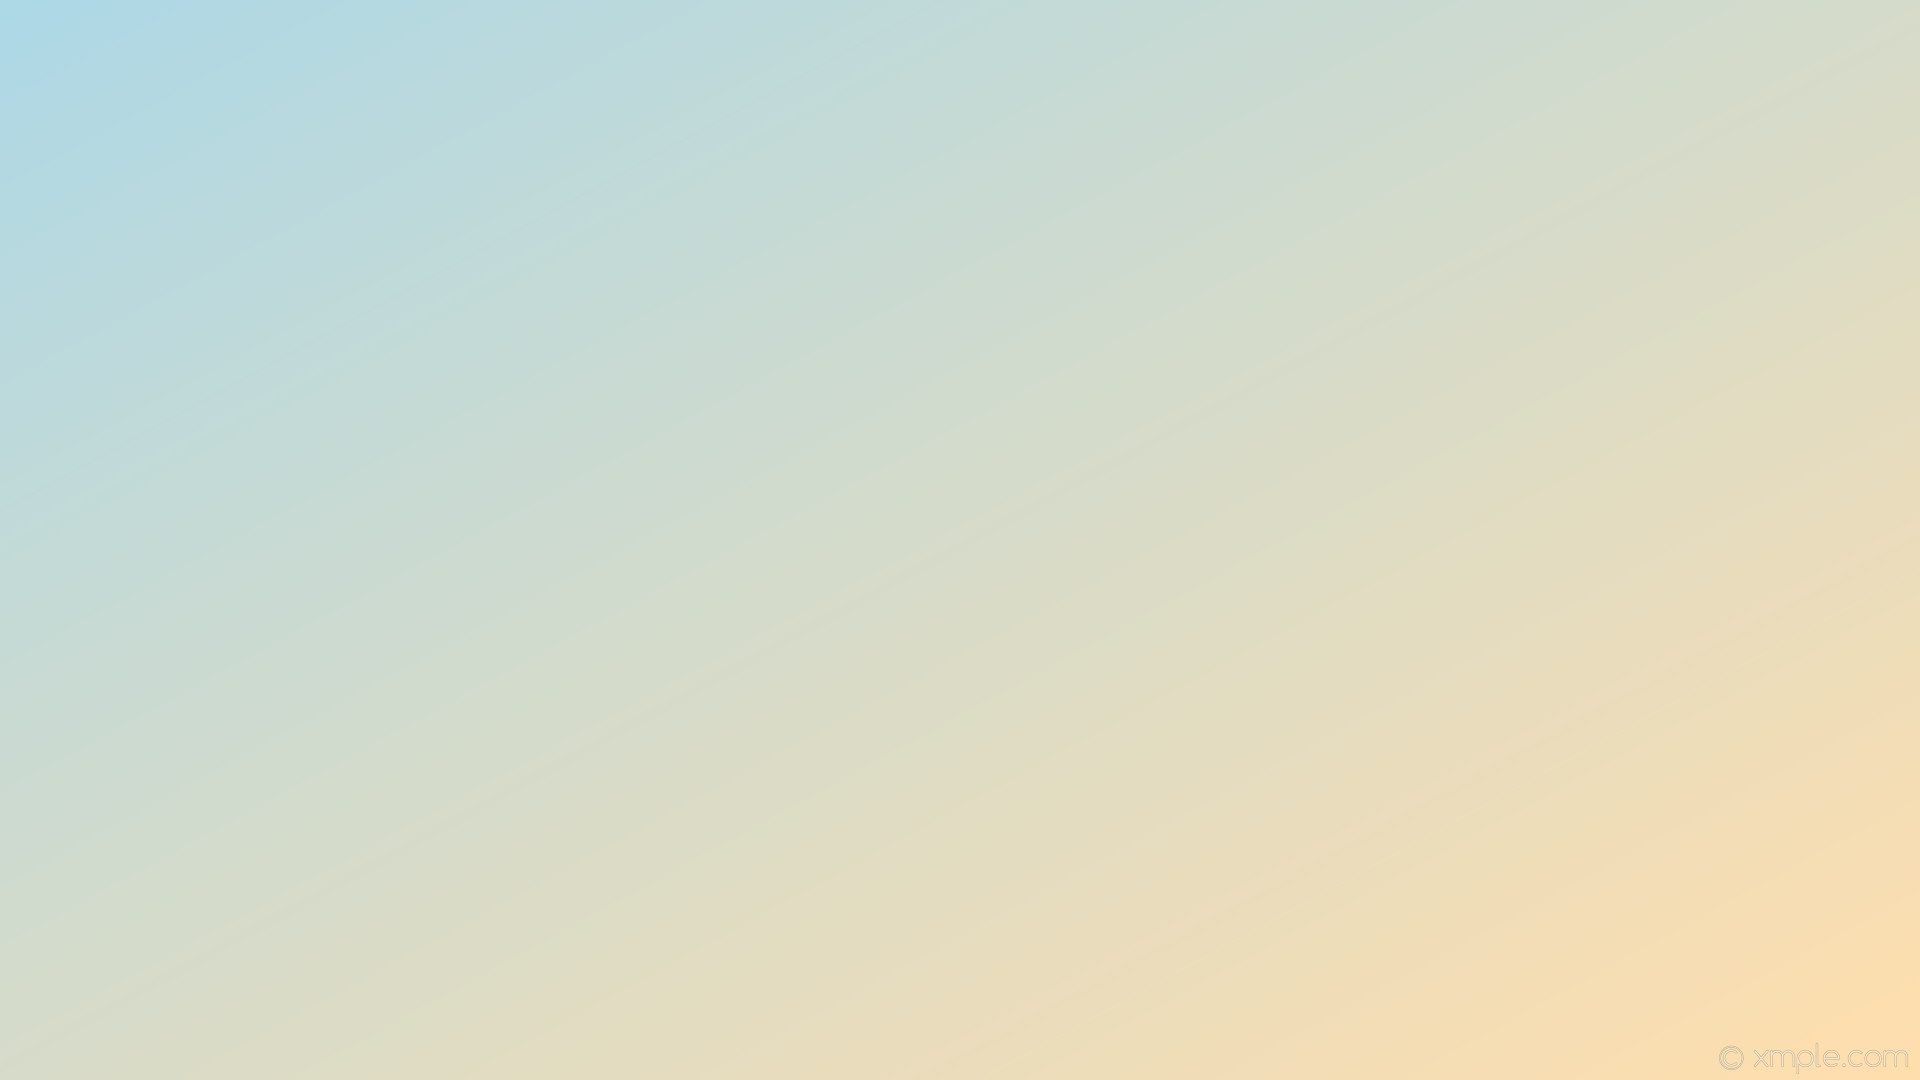 wallpaper brown blue gradient linear light blue navajo white #add8e6  #ffdead 150°